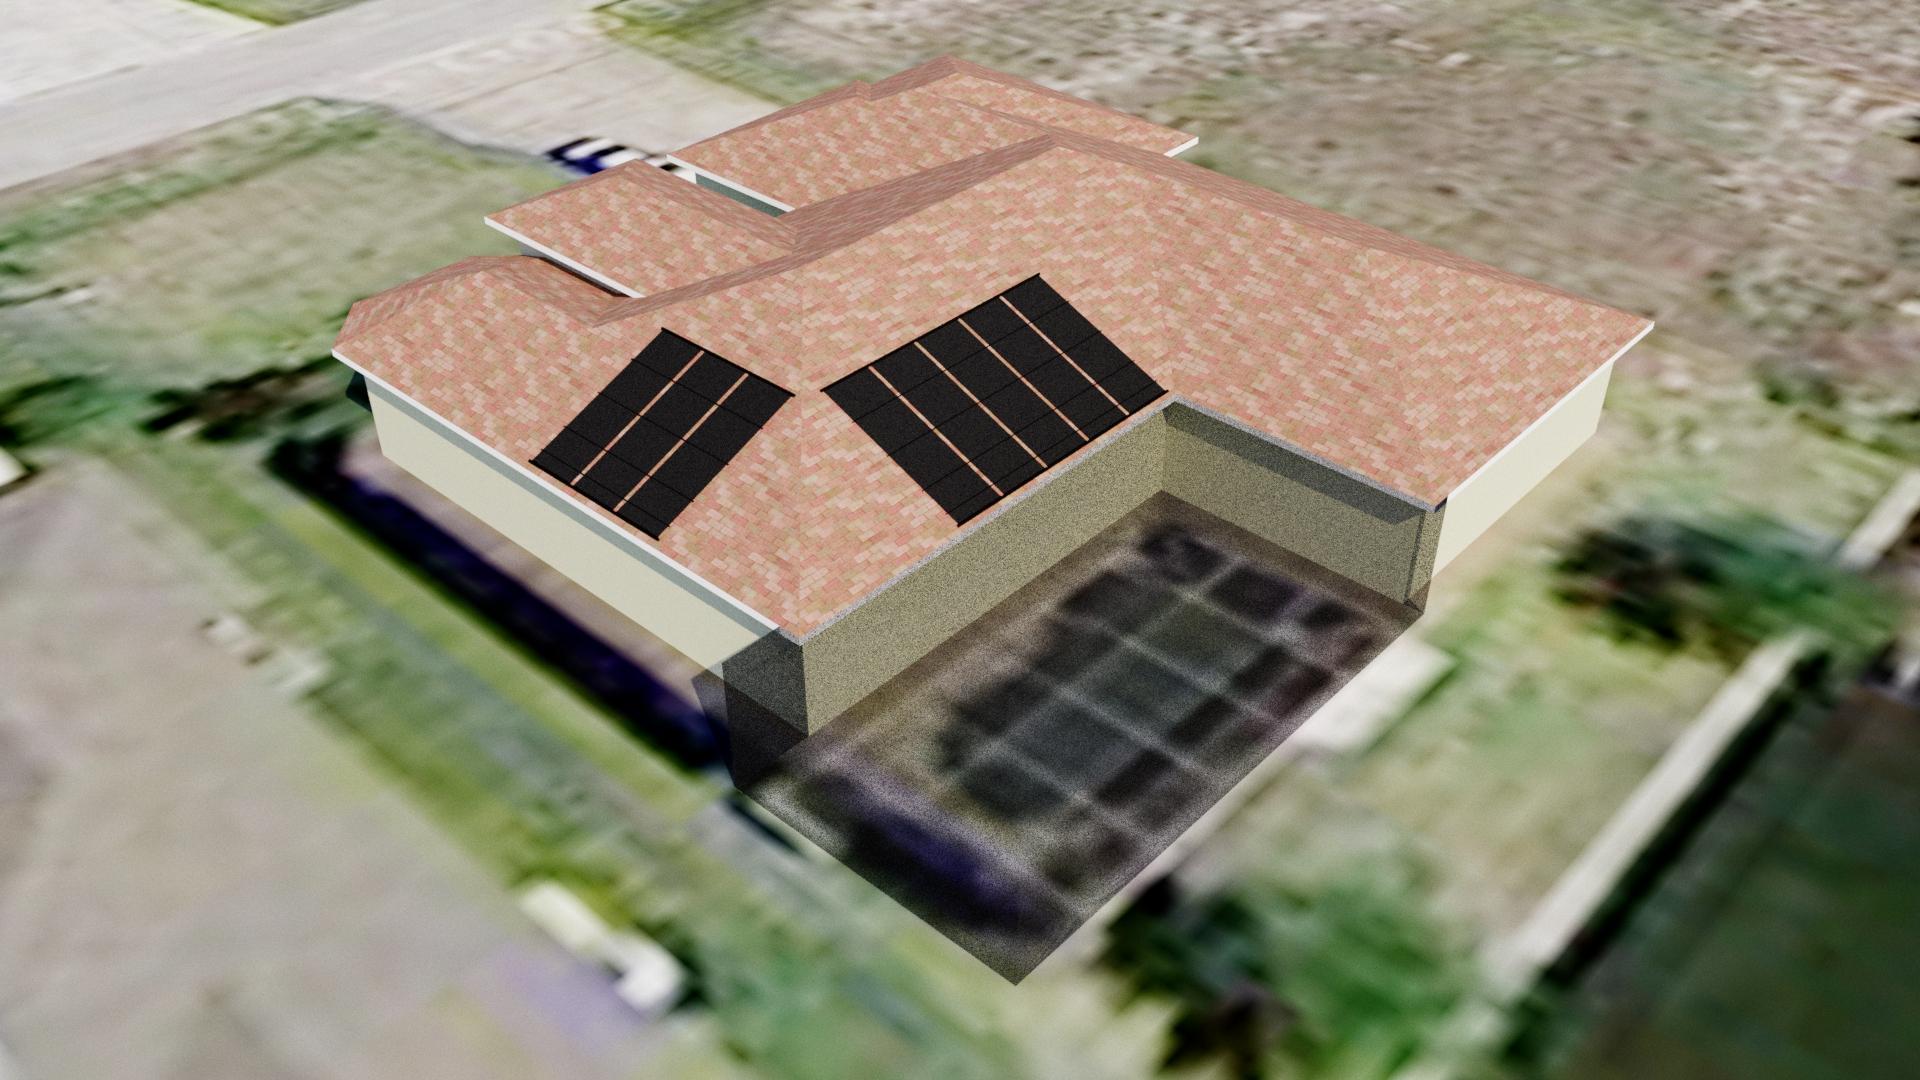 Solar Pool Heater Design in Northwest Cape Coral